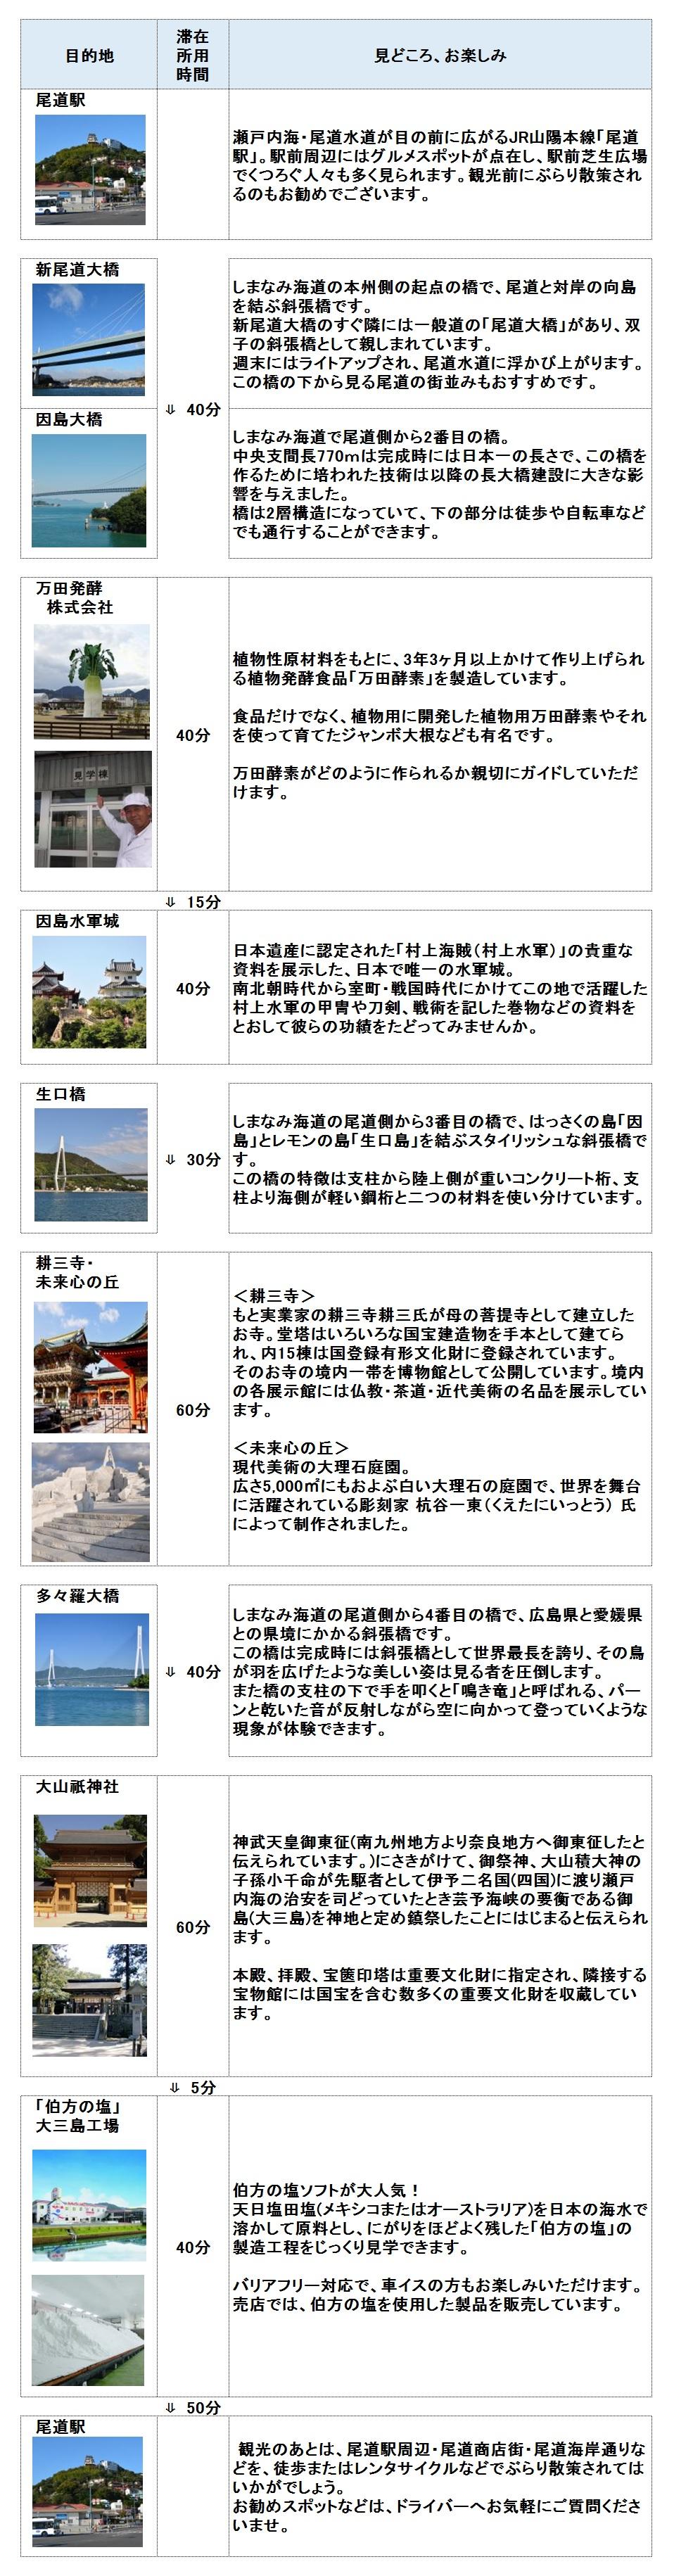 10.shimanami